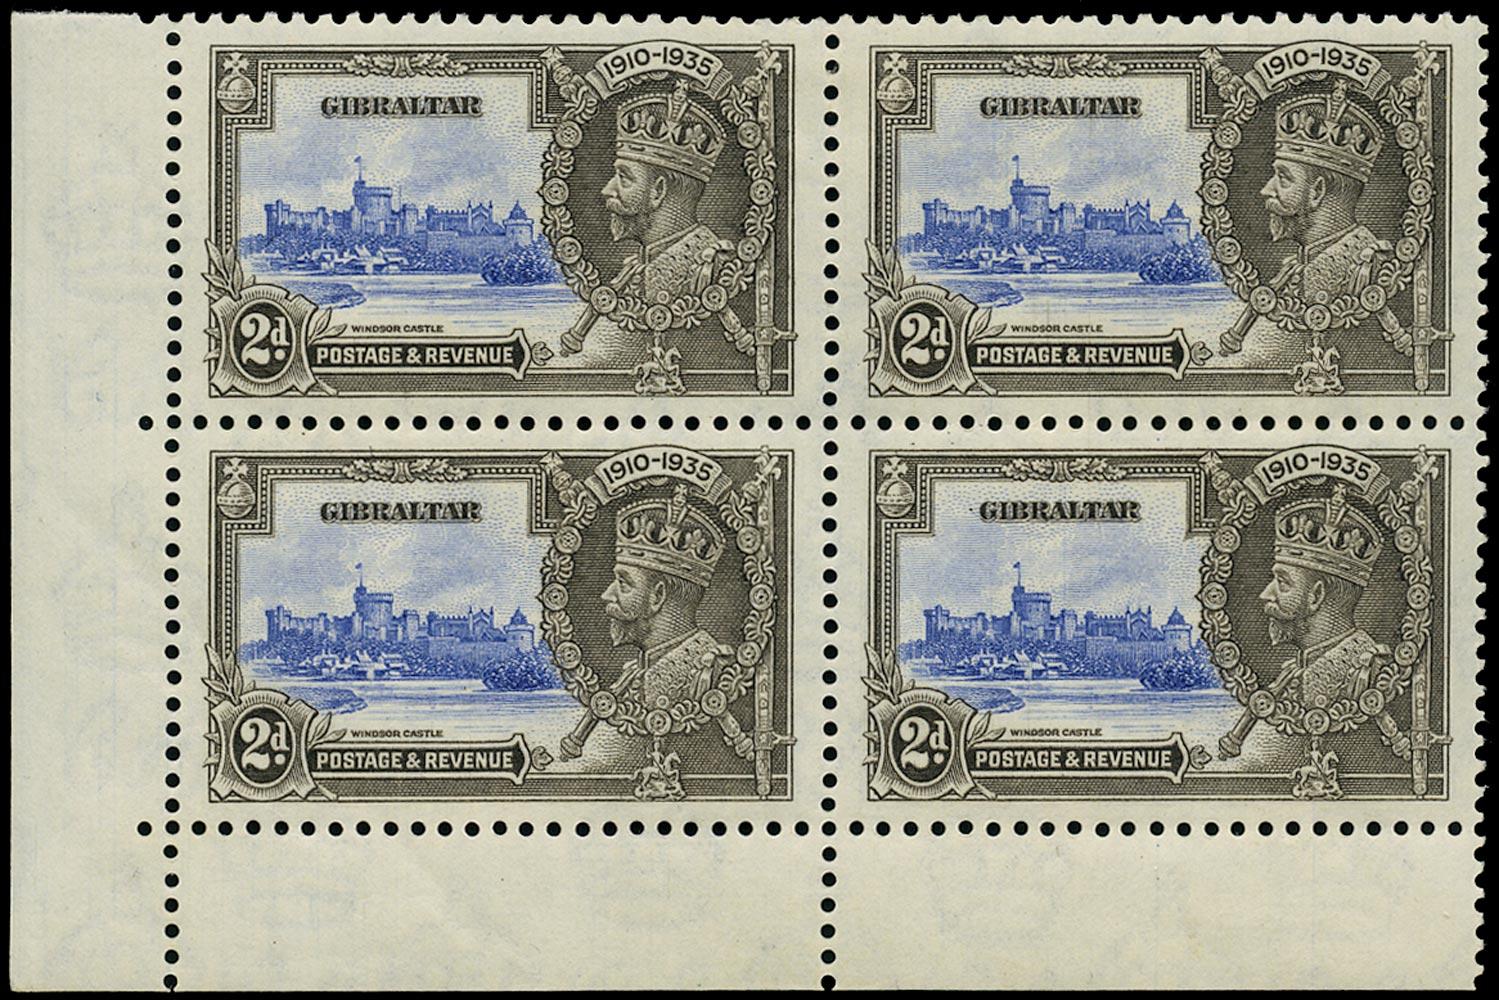 GIBRALTAR 1935  SG114a Mint Silver Jubilee 2d ultramarine and black variety Extra flagstaff